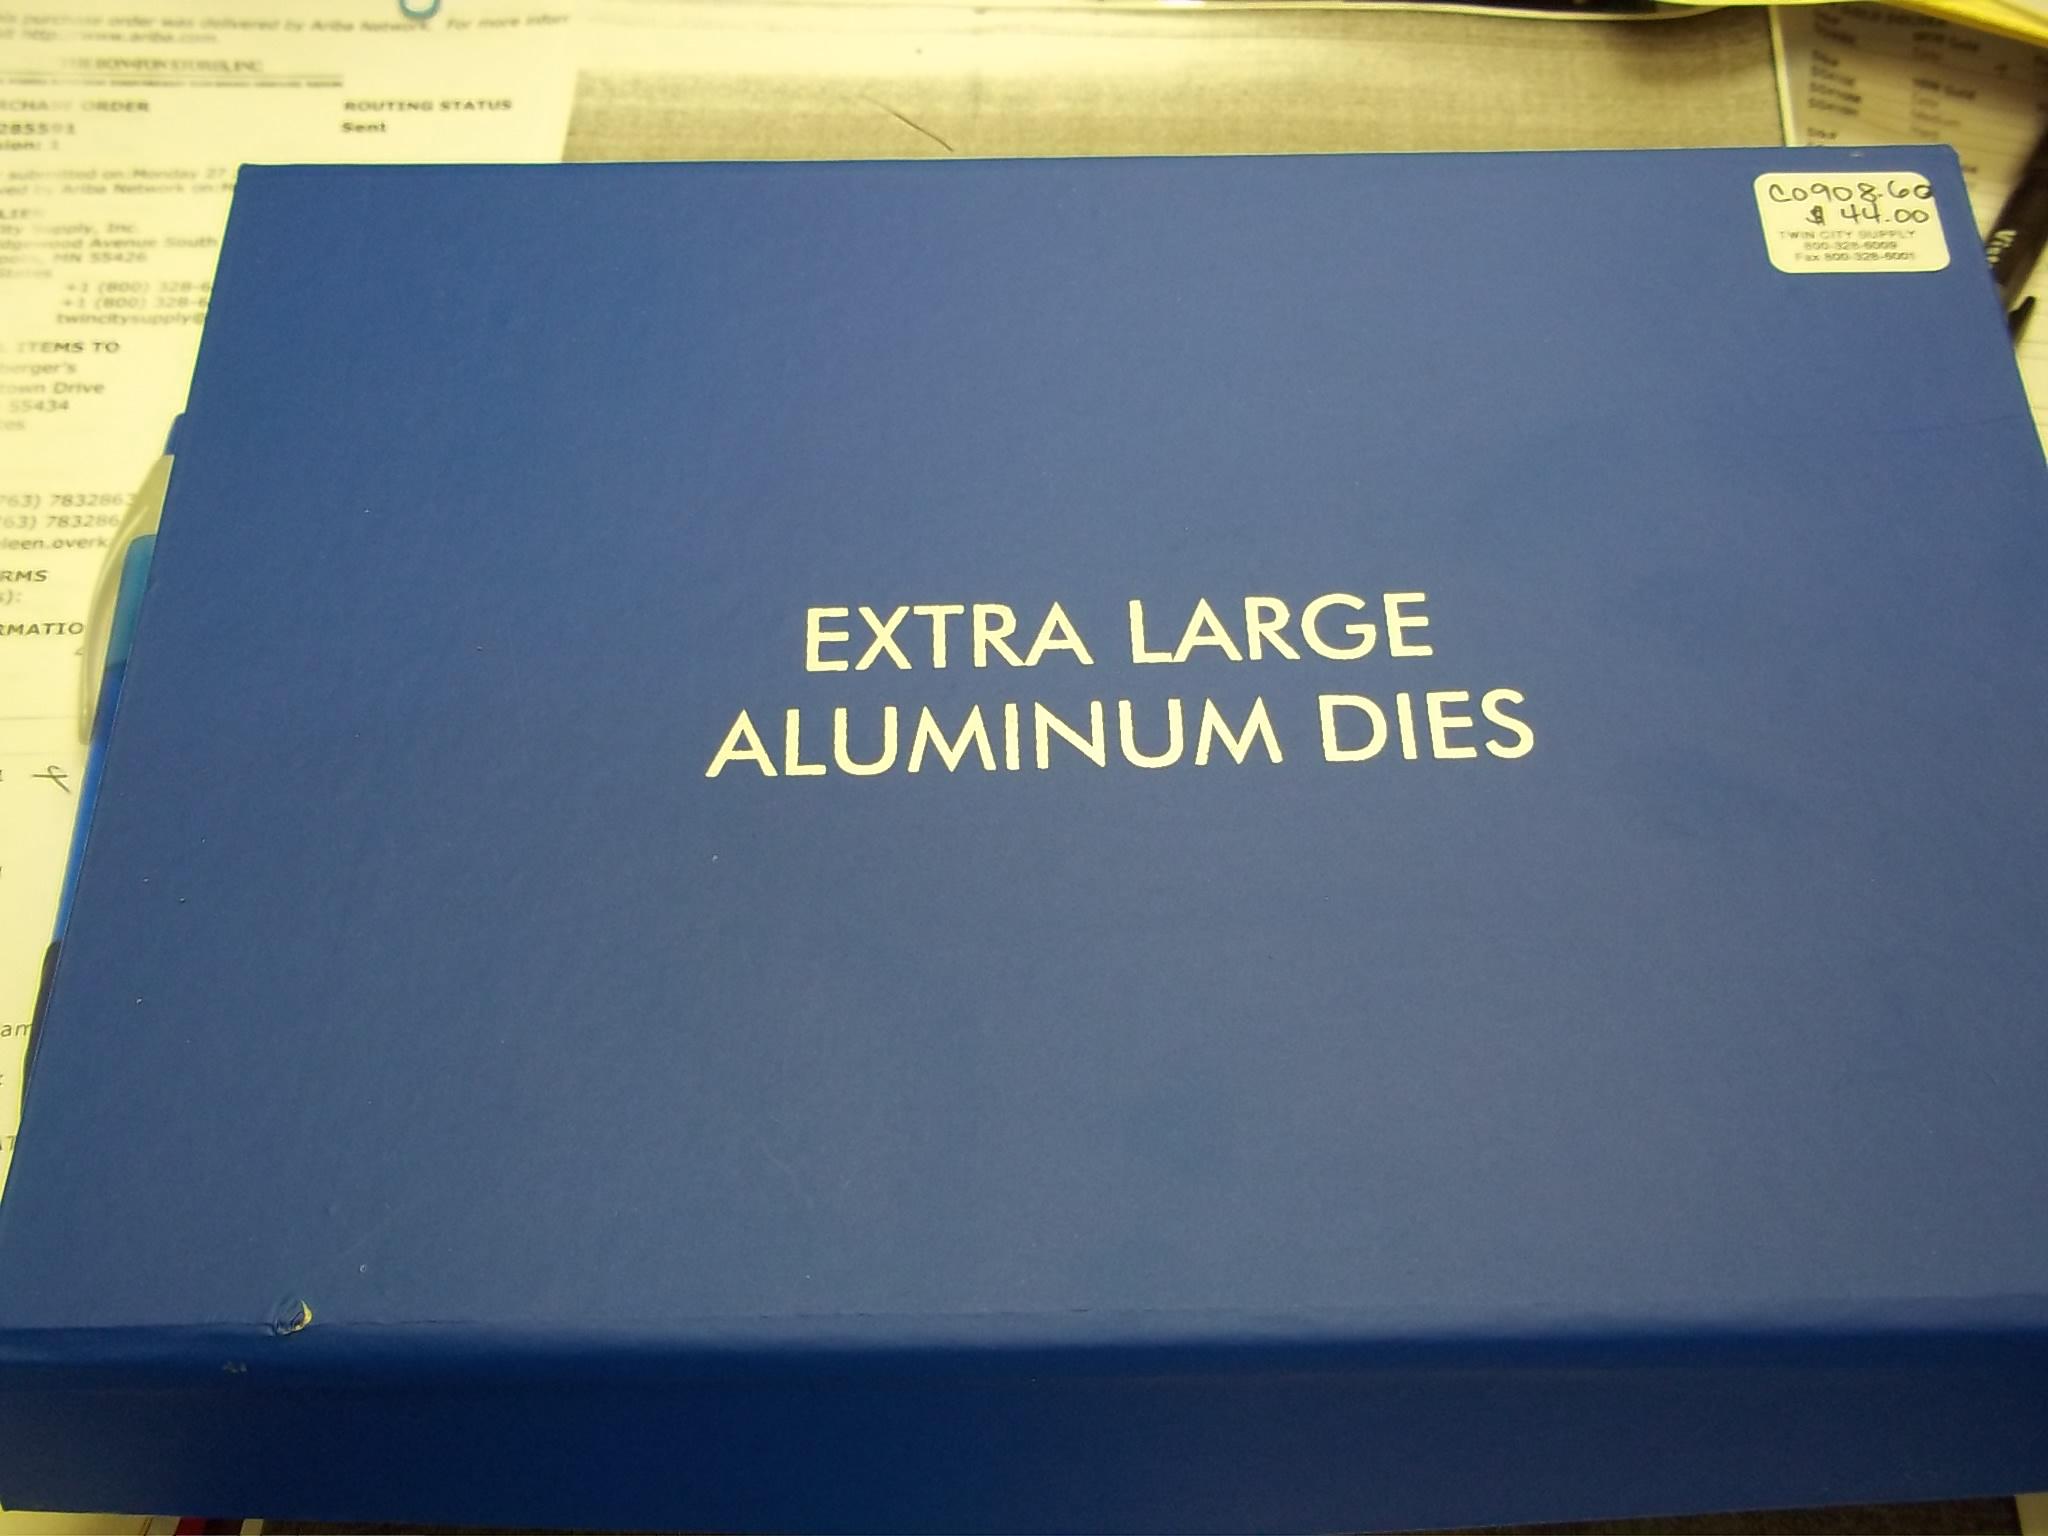 CO908.60 NEW! Set of 6 Extra Large Aluminum Dies